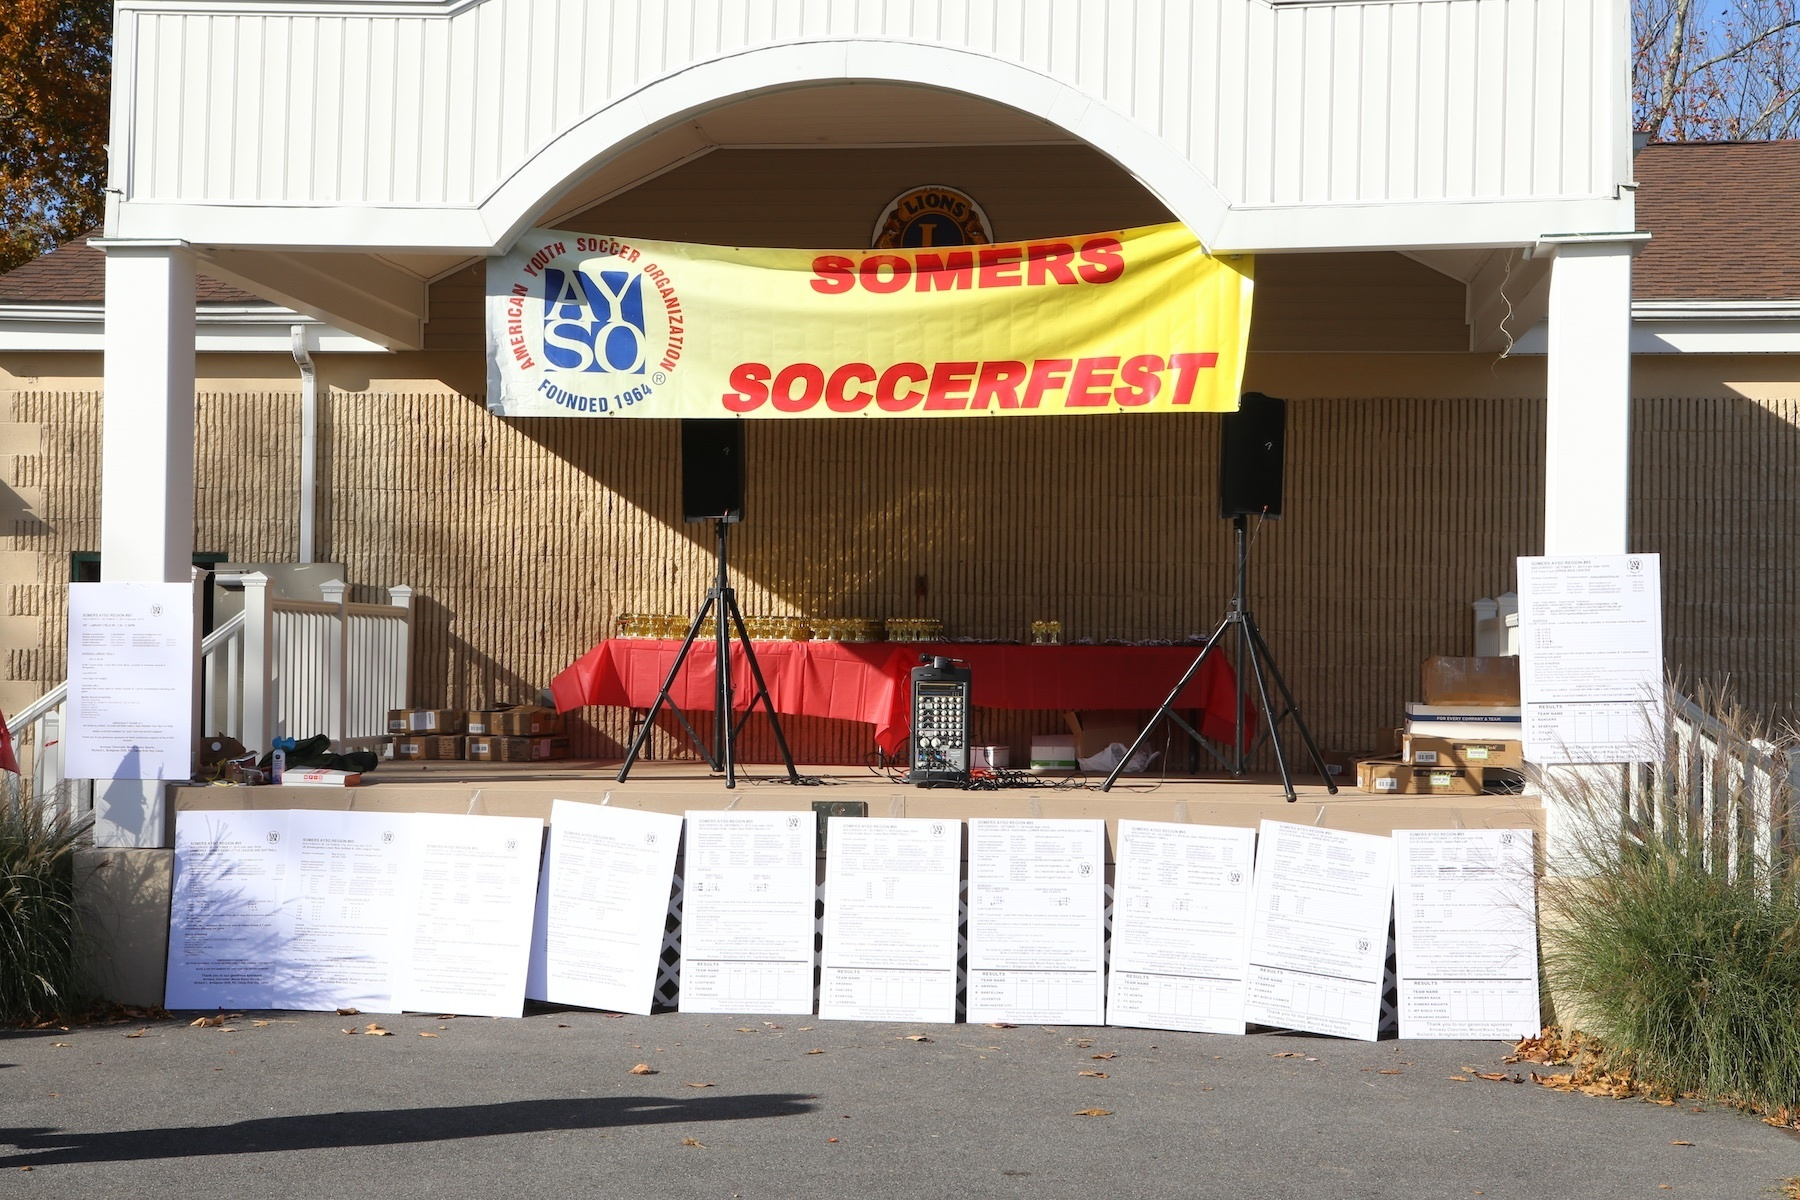 64e56b09dd1b0dc8b993_SR101715-Soccerfest_23.jpg